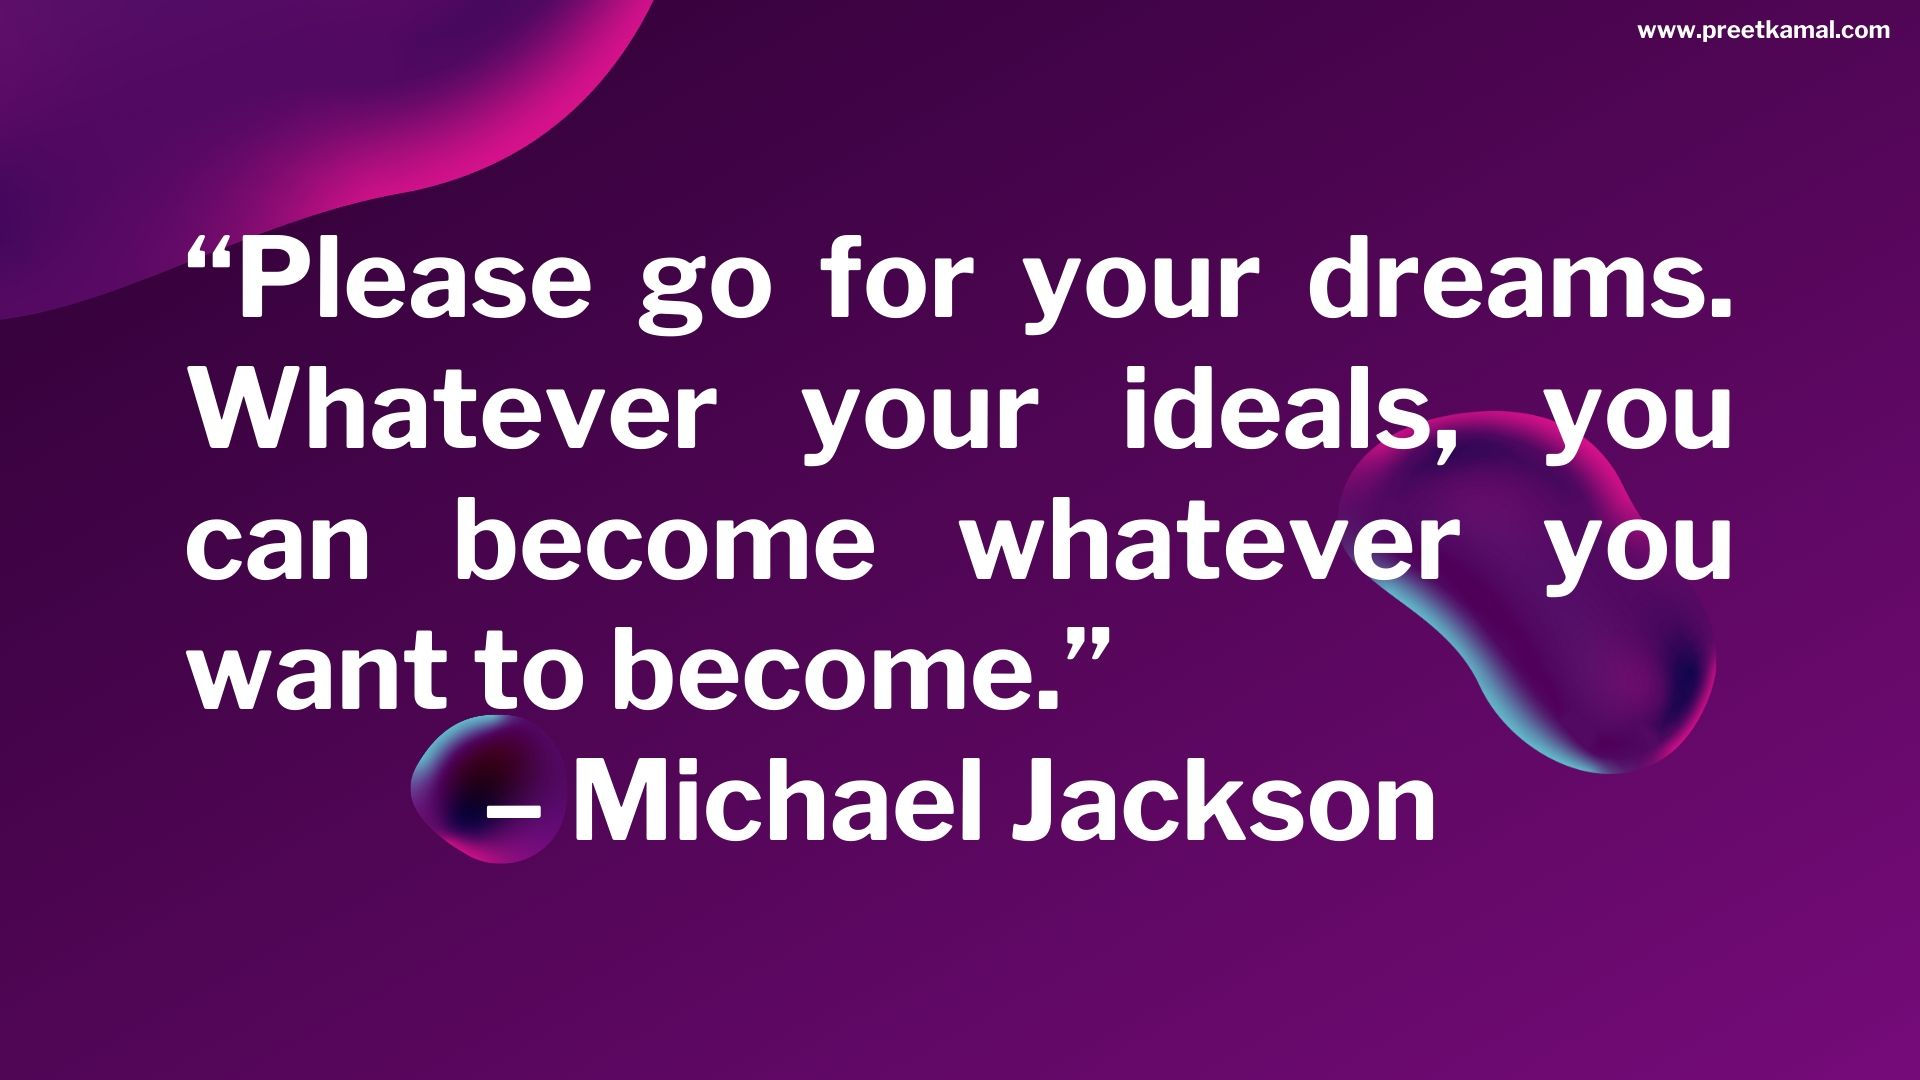 Michael Jackson Quotes (3)